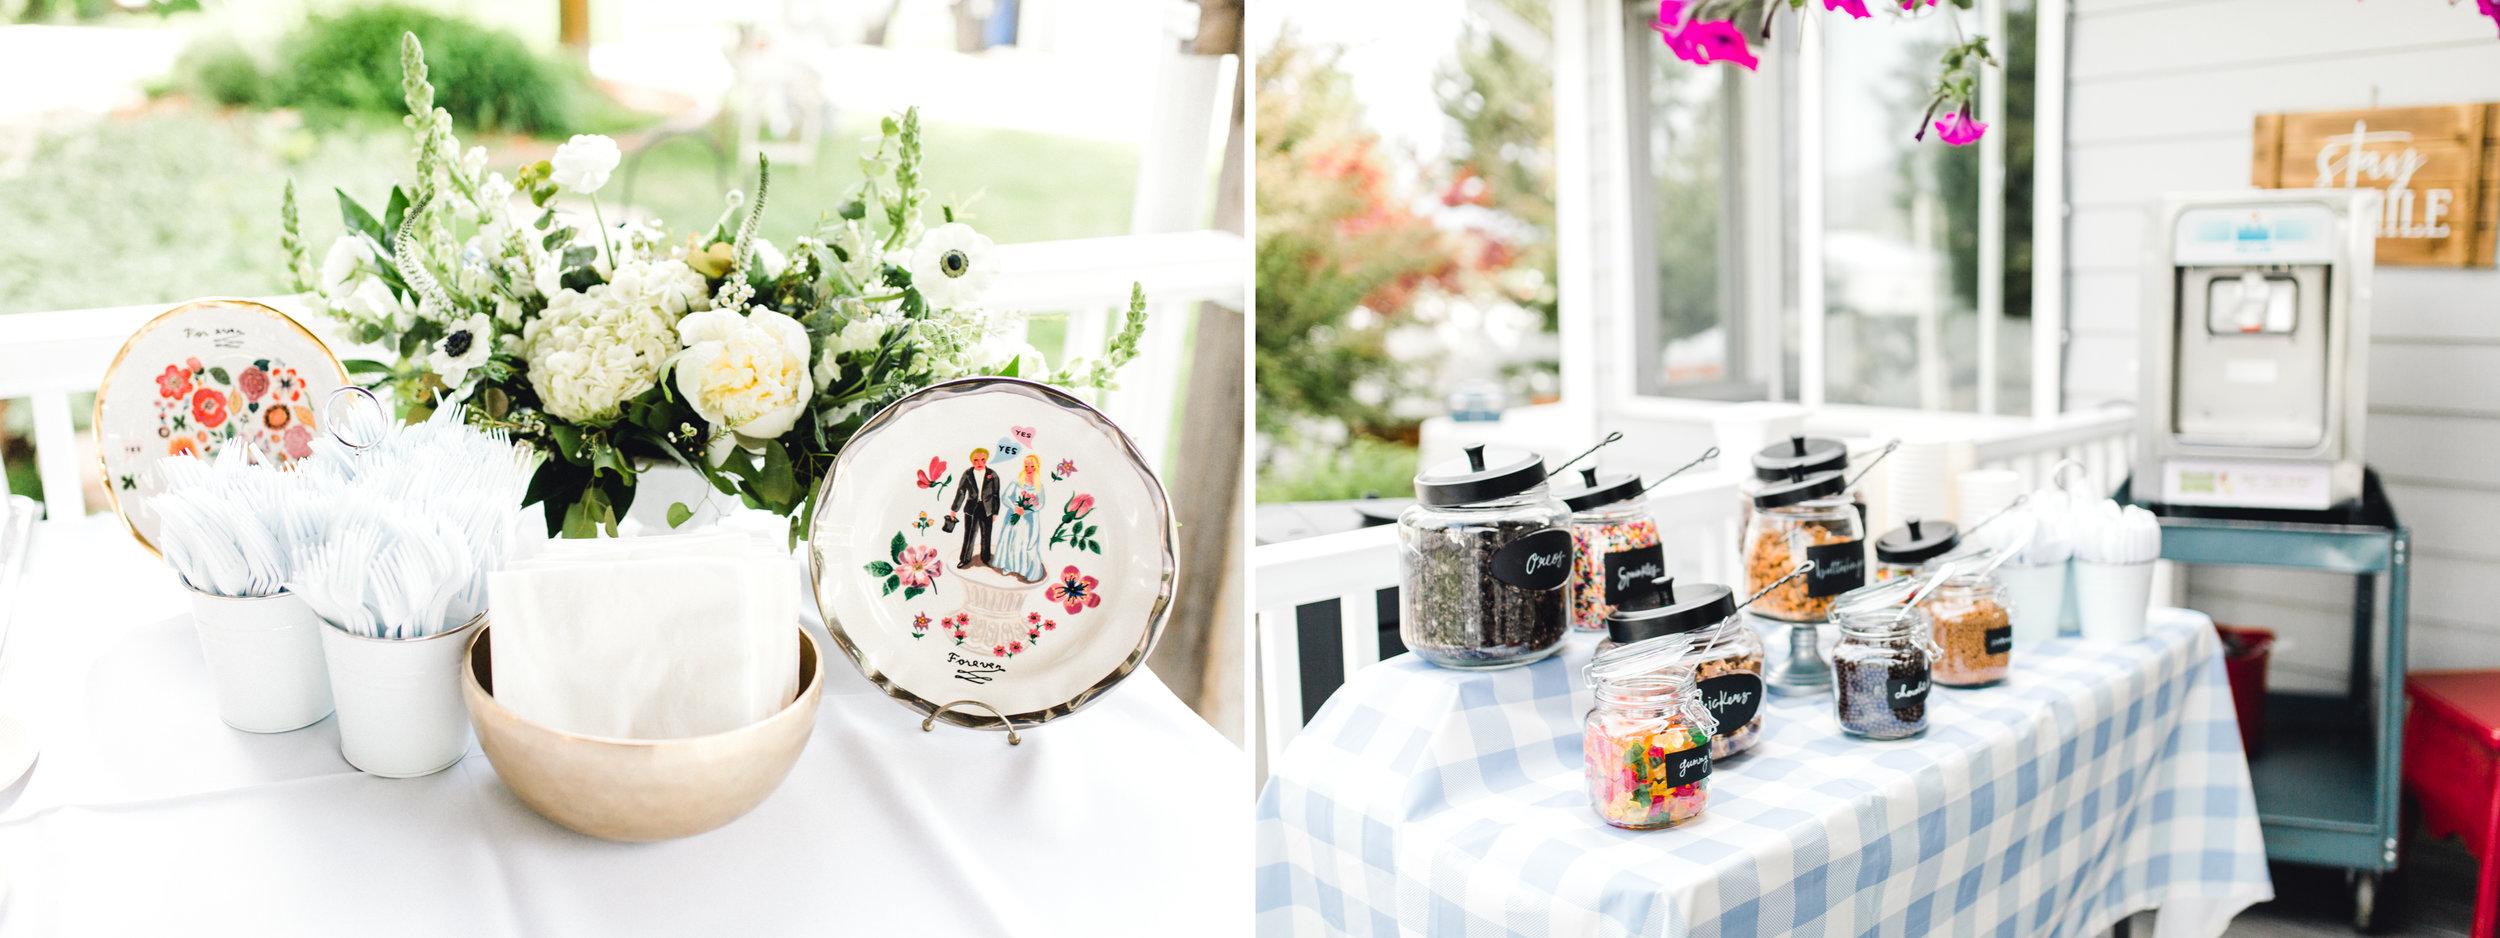 beautiful-outdoor-backyard-wedding-reception-anna-christine-photography-rexburg-idaho-20.jpg